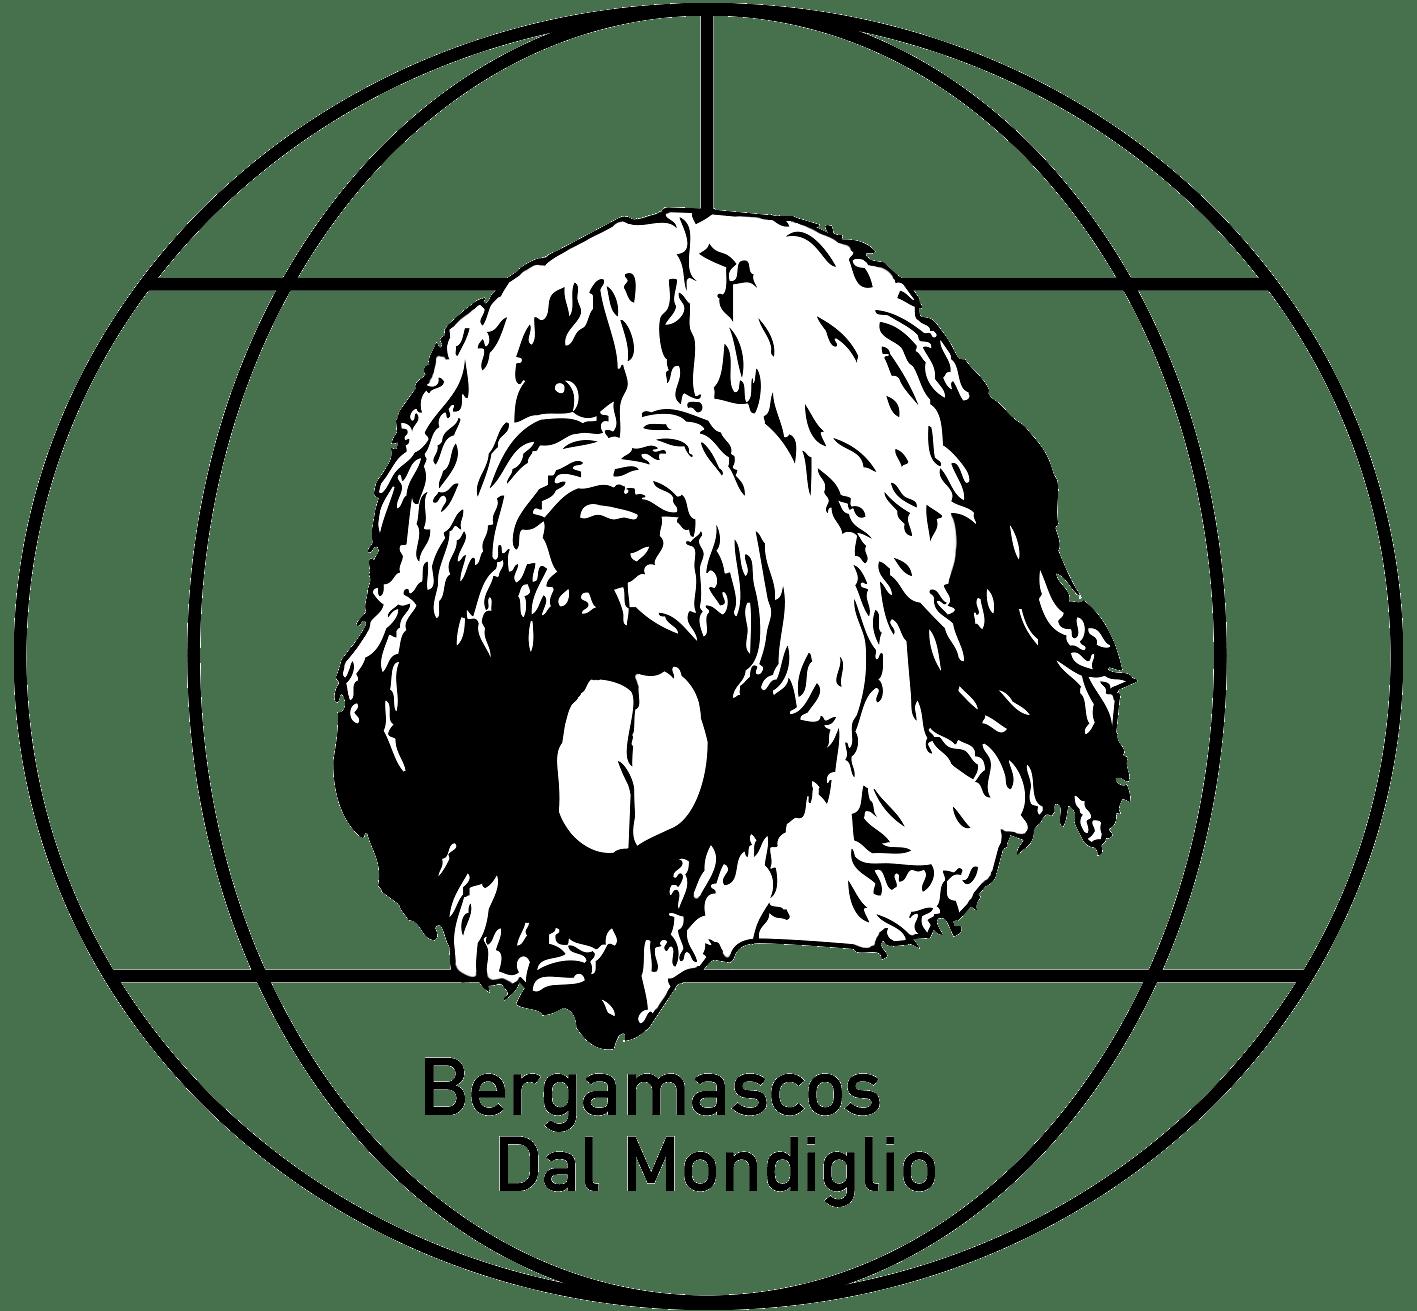 Bergamasker Hirtenhund Dal Mondiglio